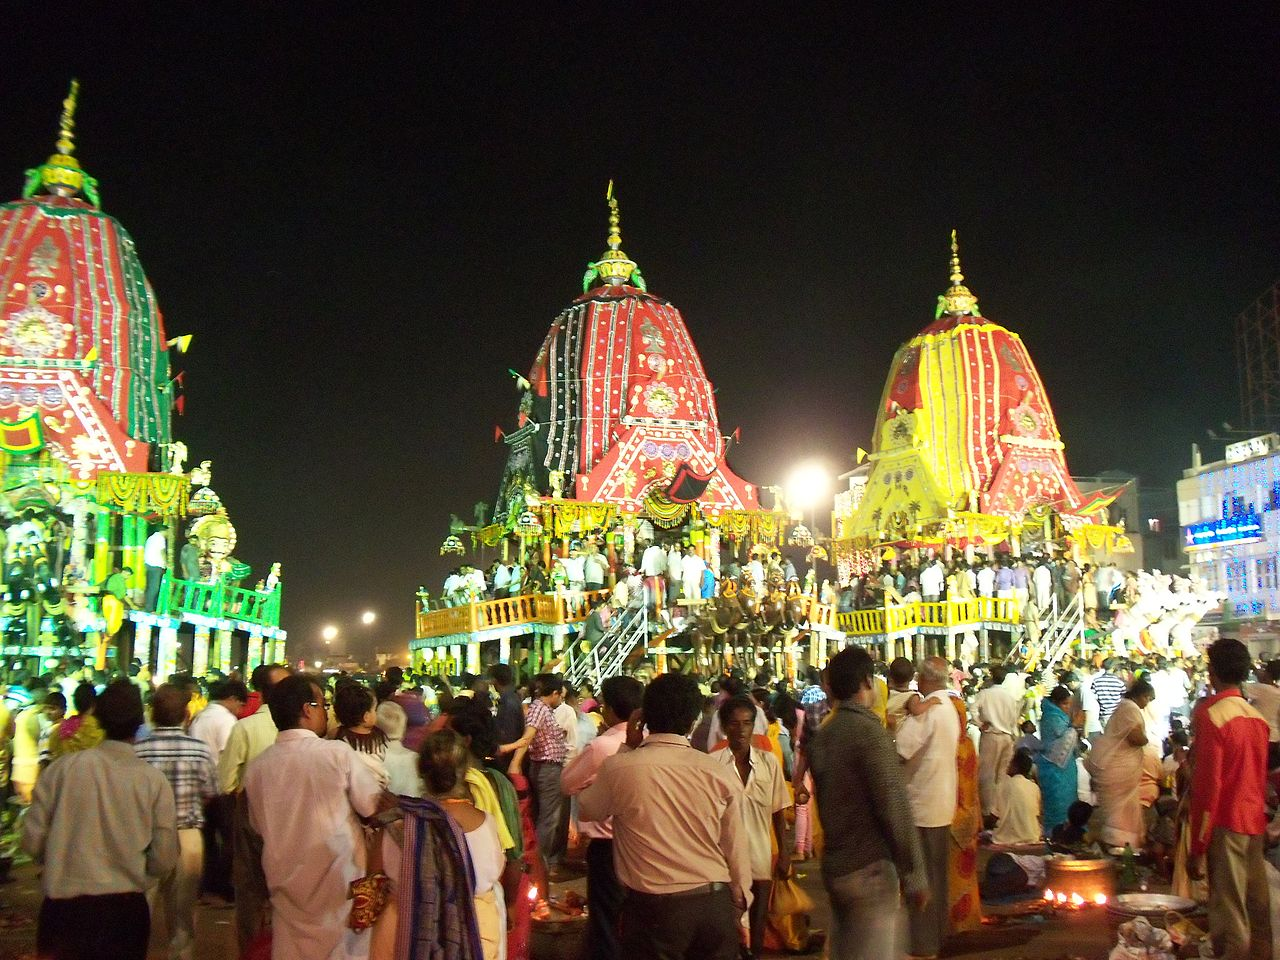 Ratha Yatra - Popular Festival Celebrated in Odisha